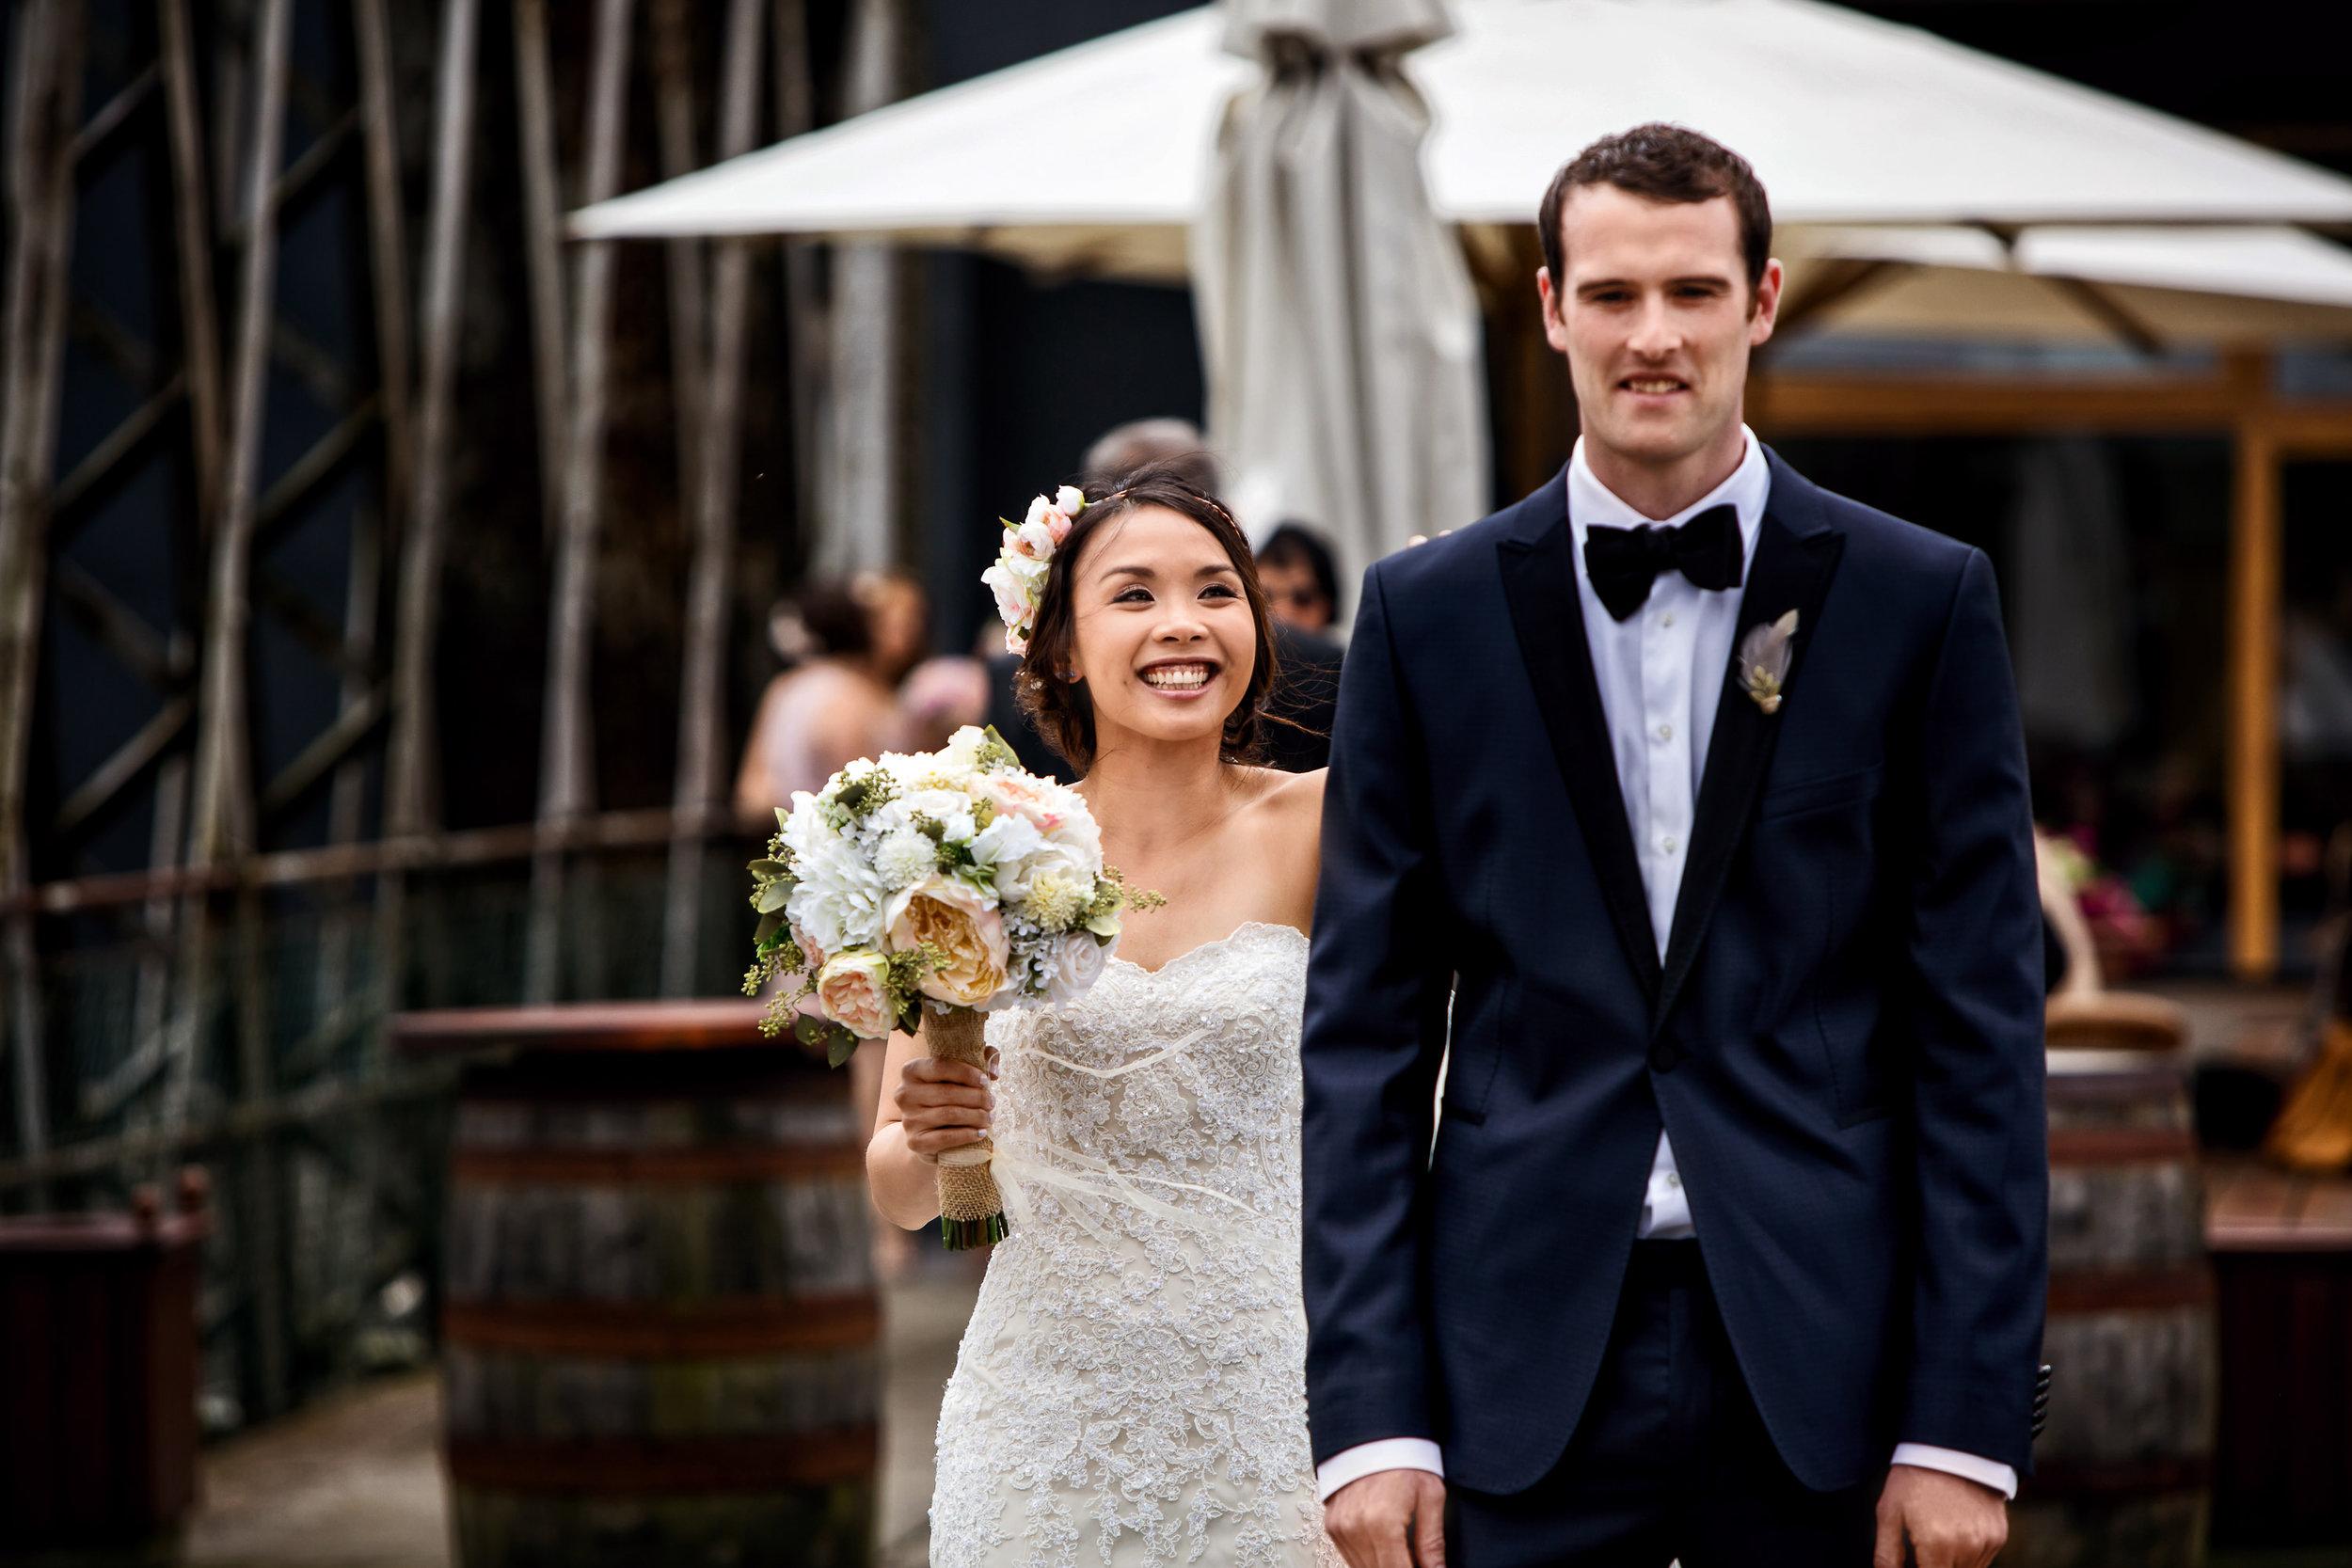 The West Cork Hotel, Skibbereen Wedding Photography. First Look wedding photography by Casey Photography